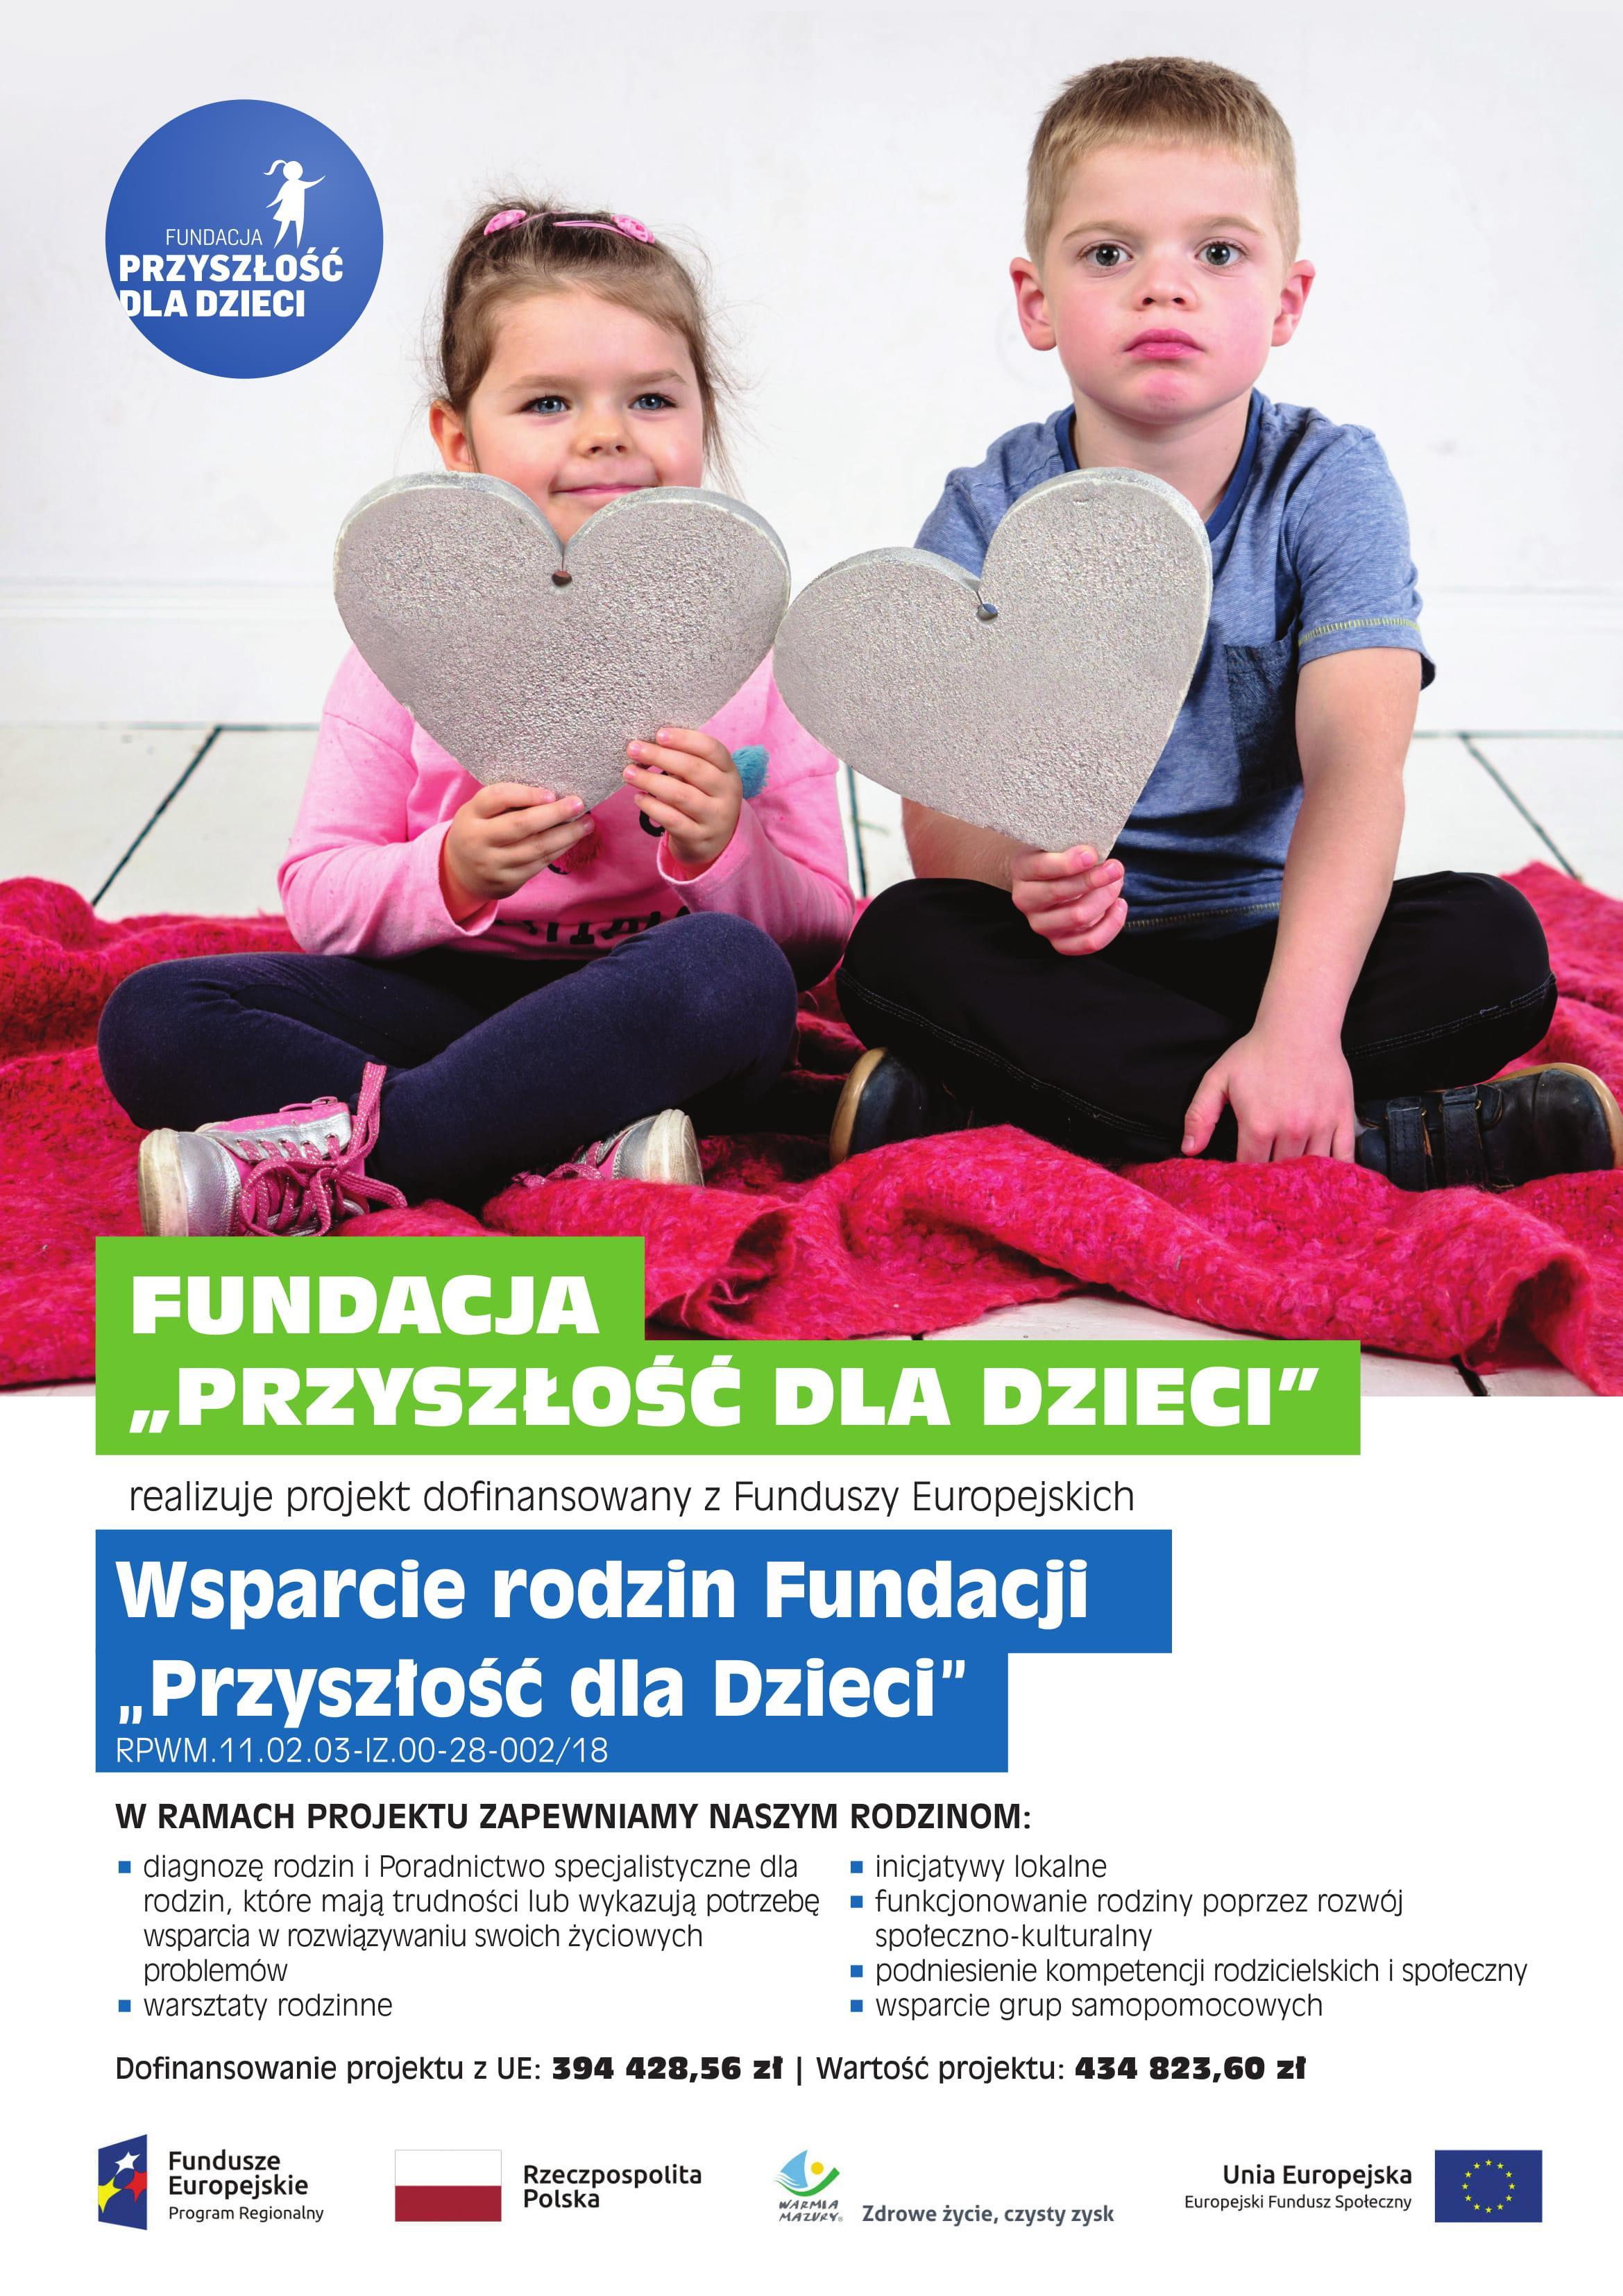 http://m.wm.pl/2019/09/orig/plakat-fundacja-unia-logo-1-nowe-logo-576852.jpg